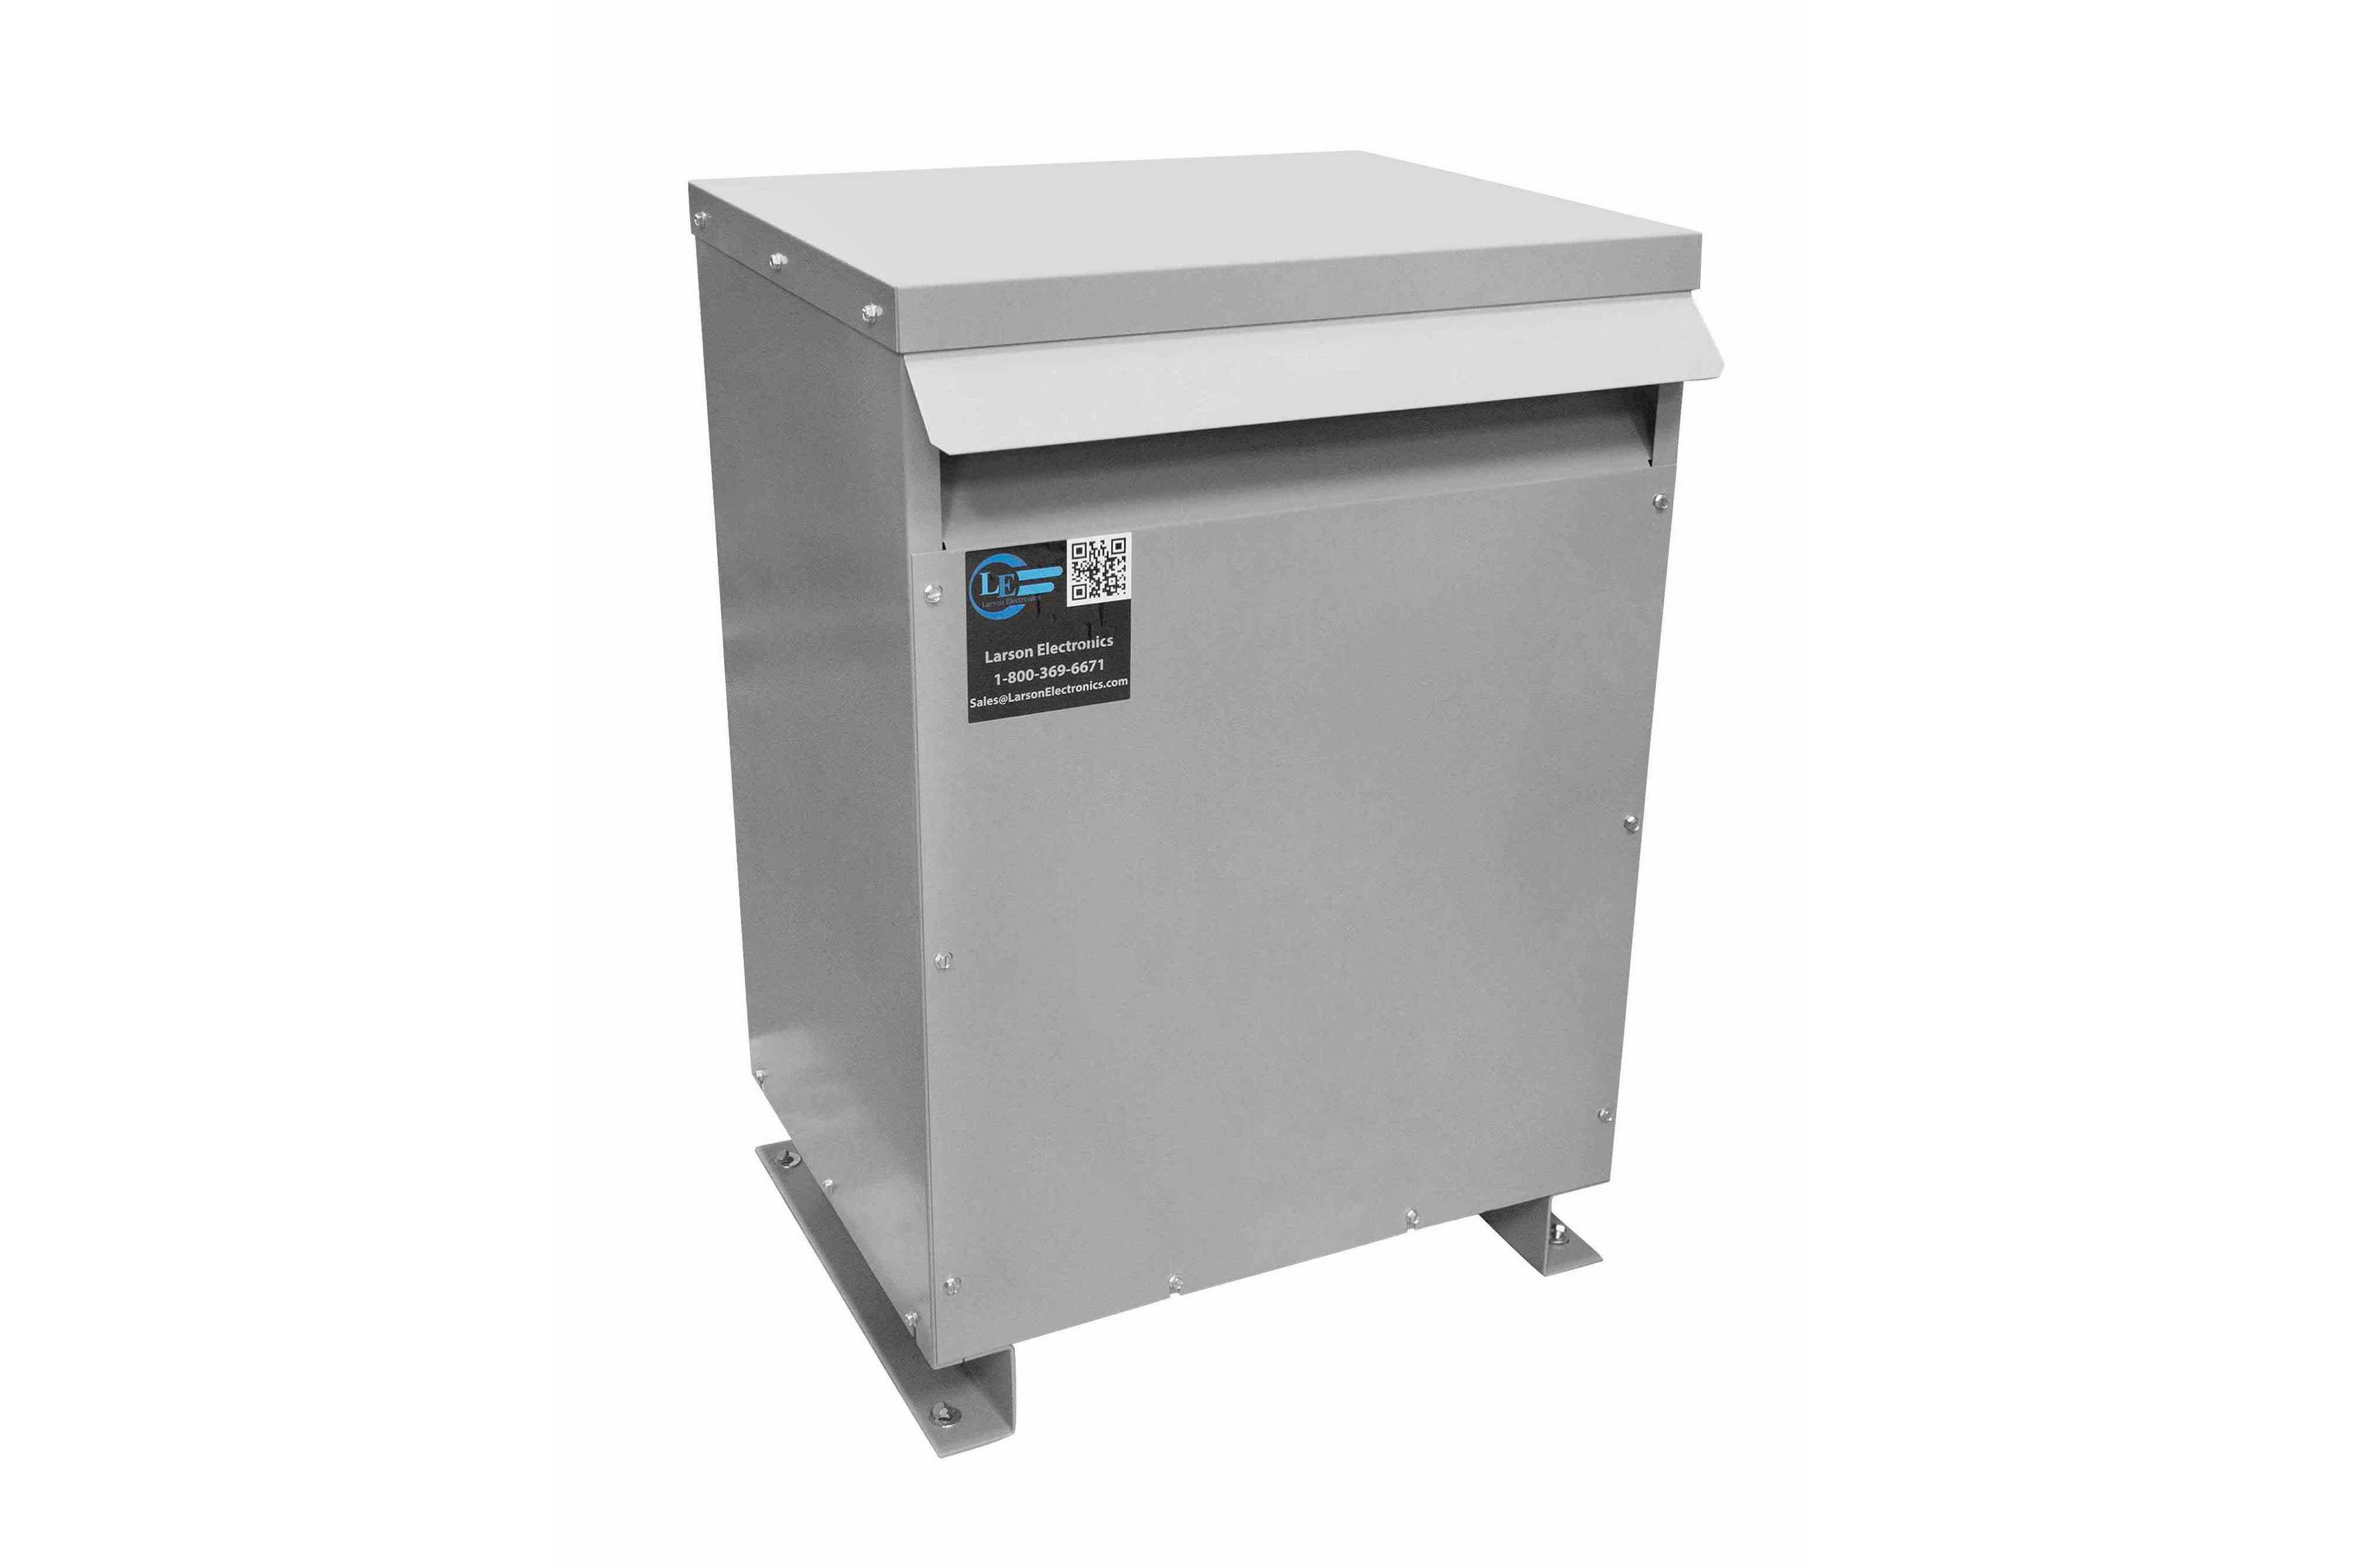 275 kVA 3PH Isolation Transformer, 380V Wye Primary, 600Y/347 Wye-N Secondary, N3R, Ventilated, 60 Hz